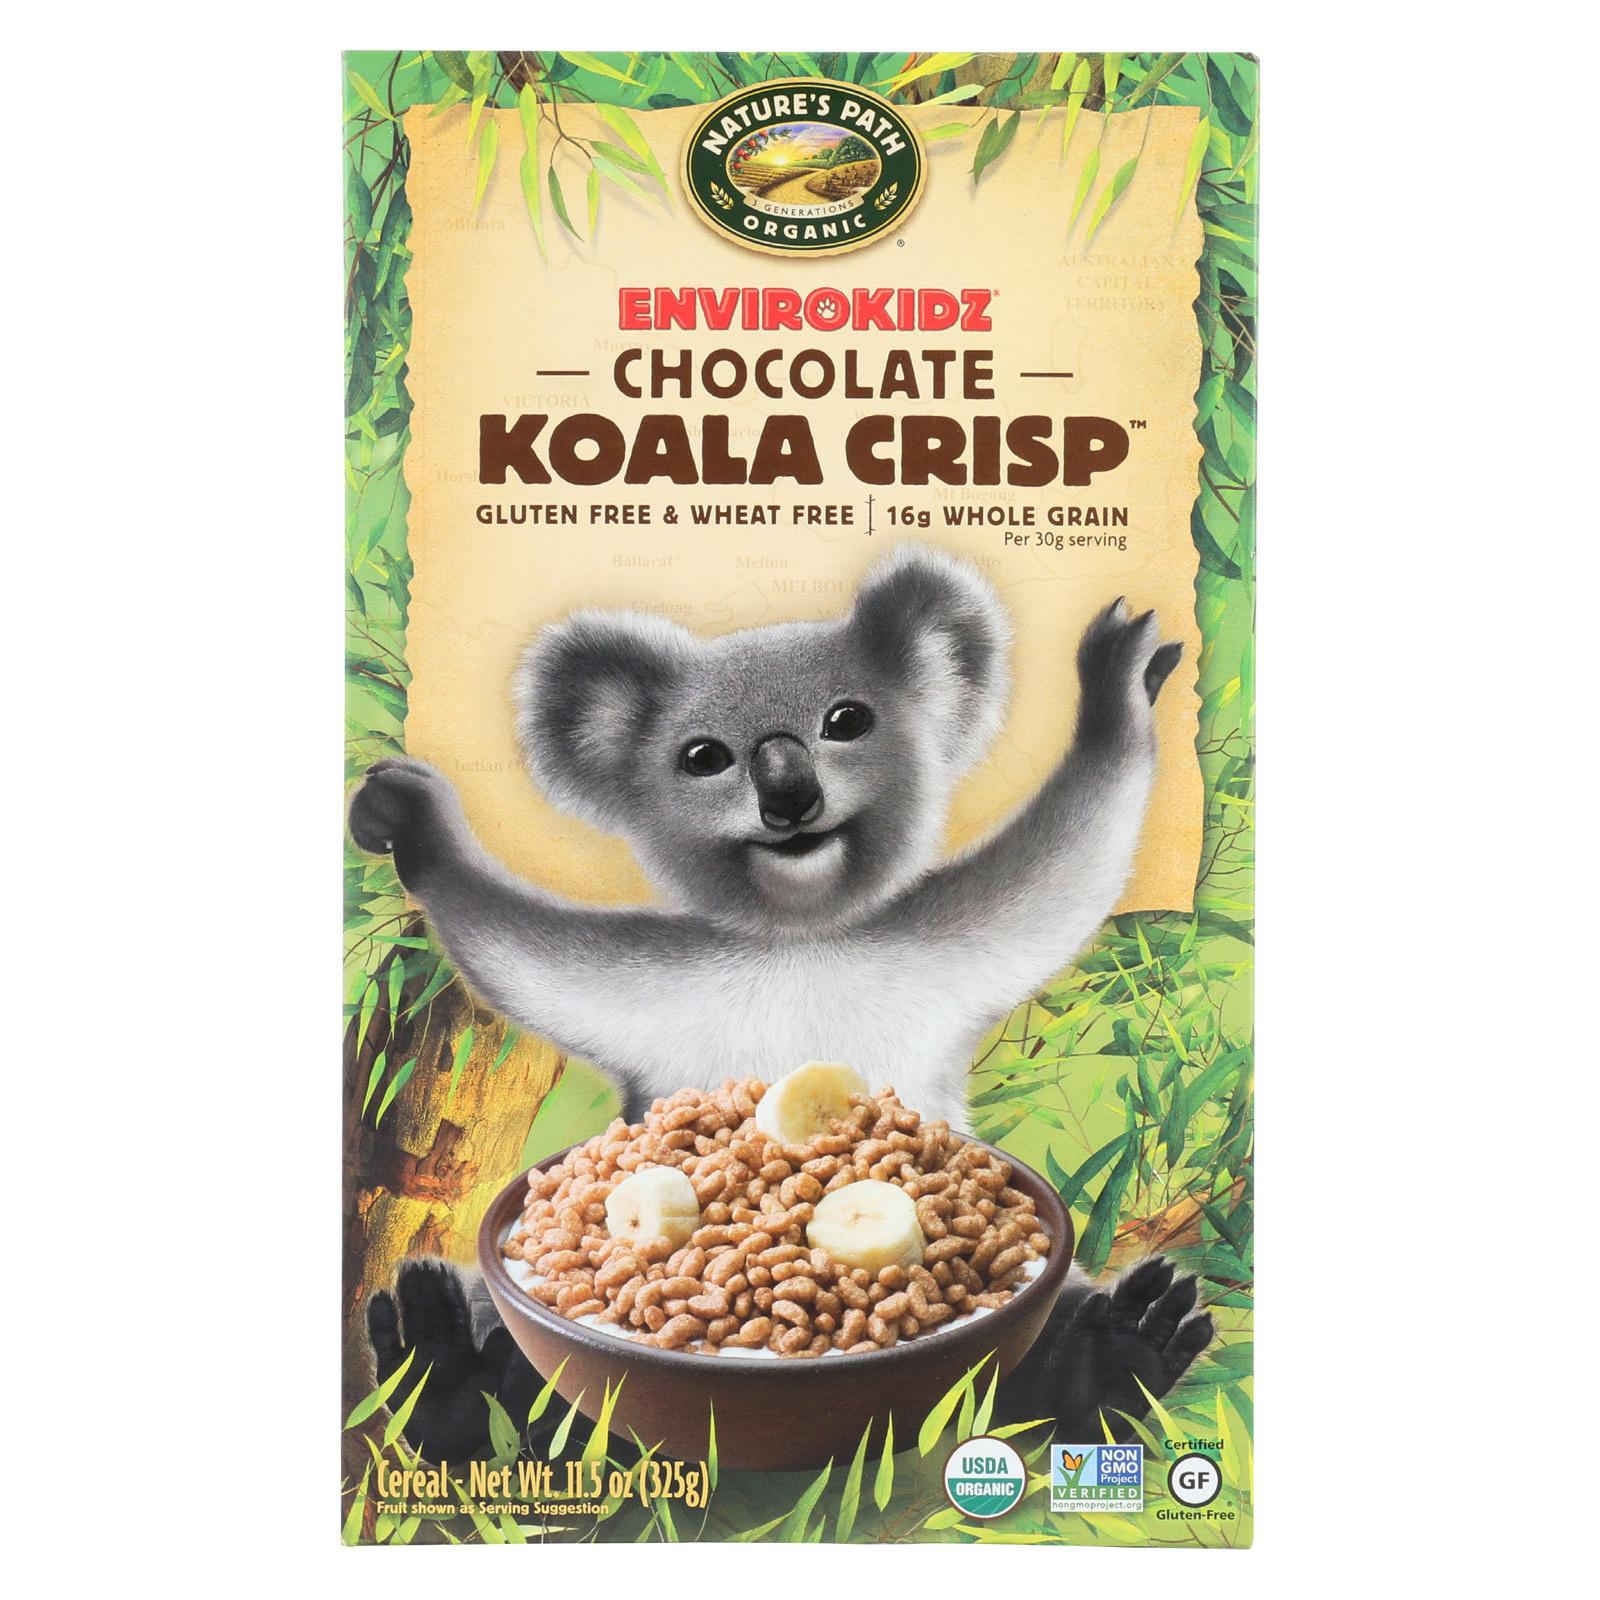 Envirokidz Organic Koala Crisp - Chocolate - 11.5 oz